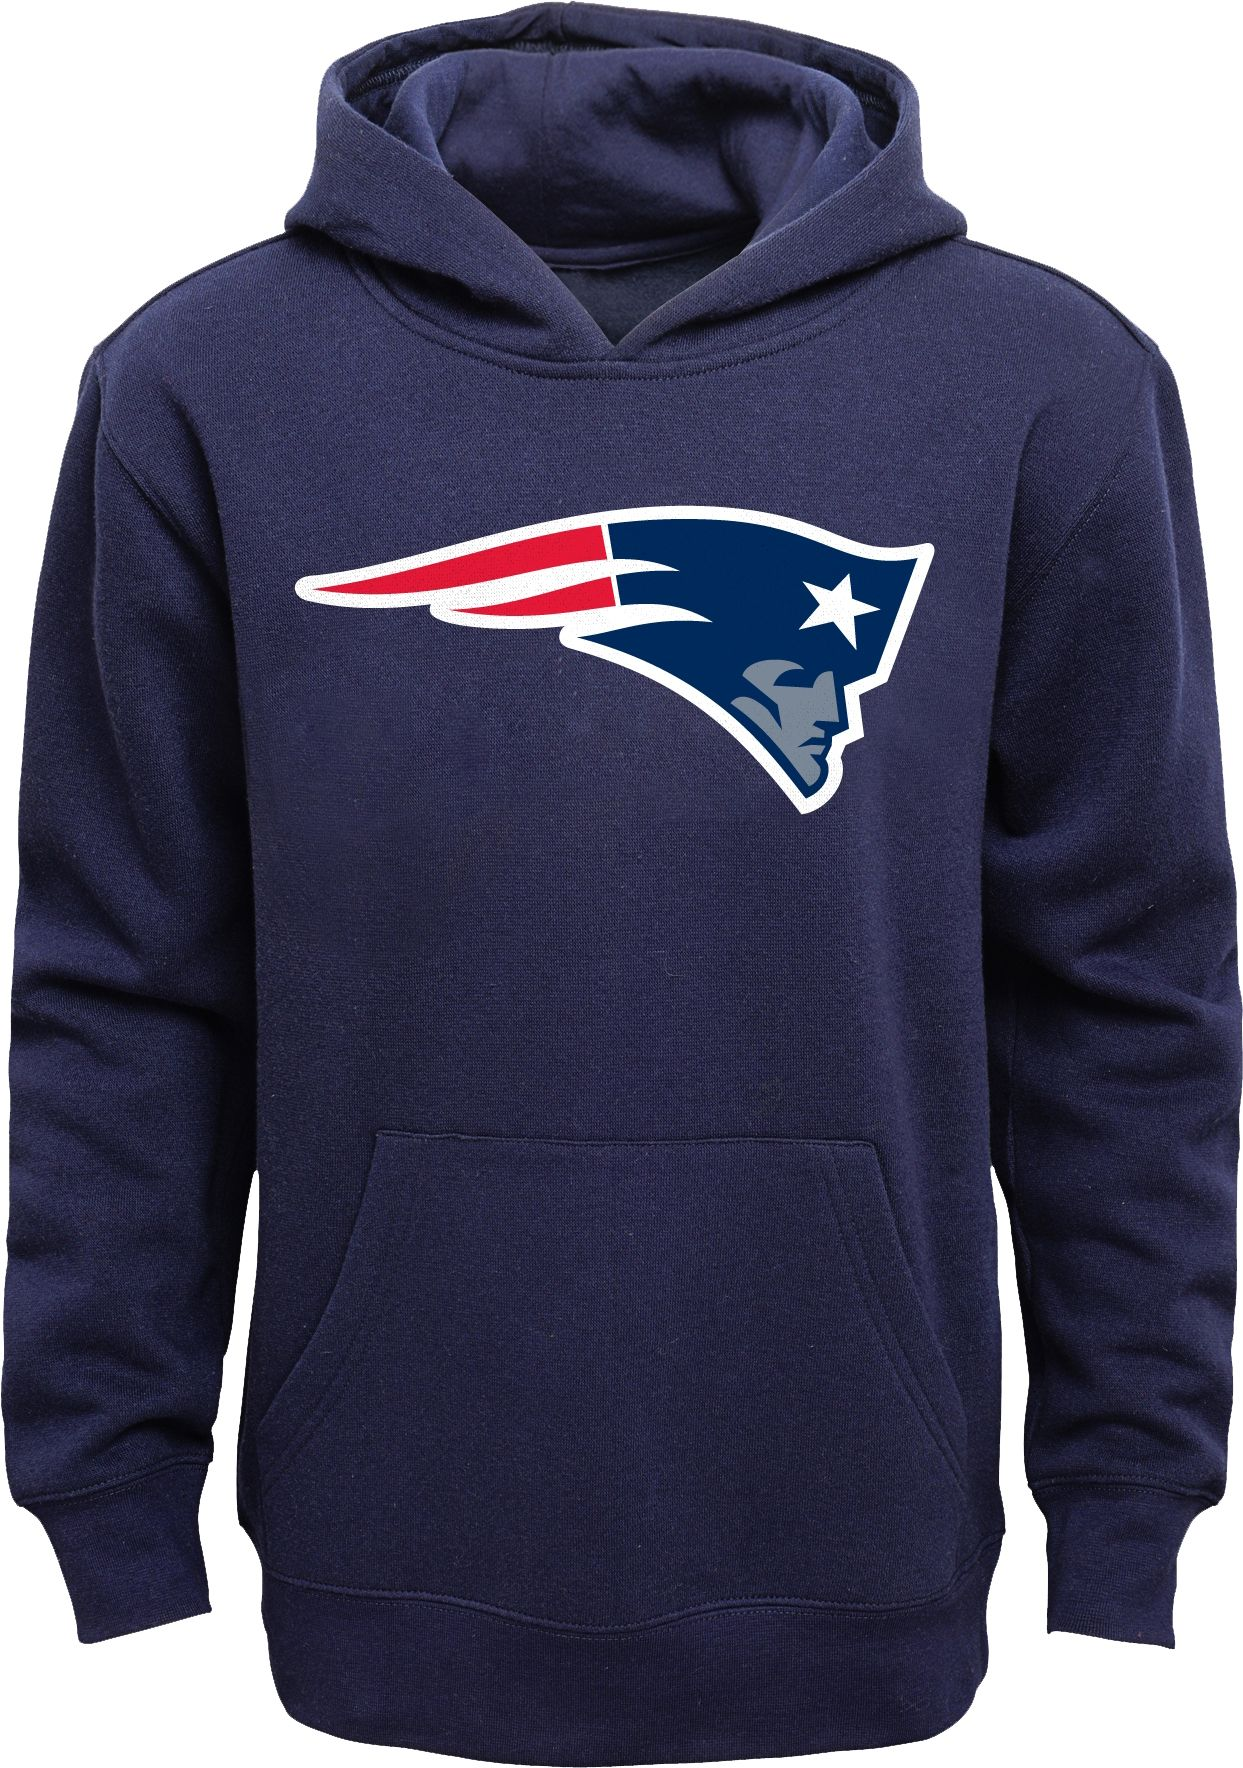 Nfl Team Apparel Youth New England Patriots Logo Navy Hoodie